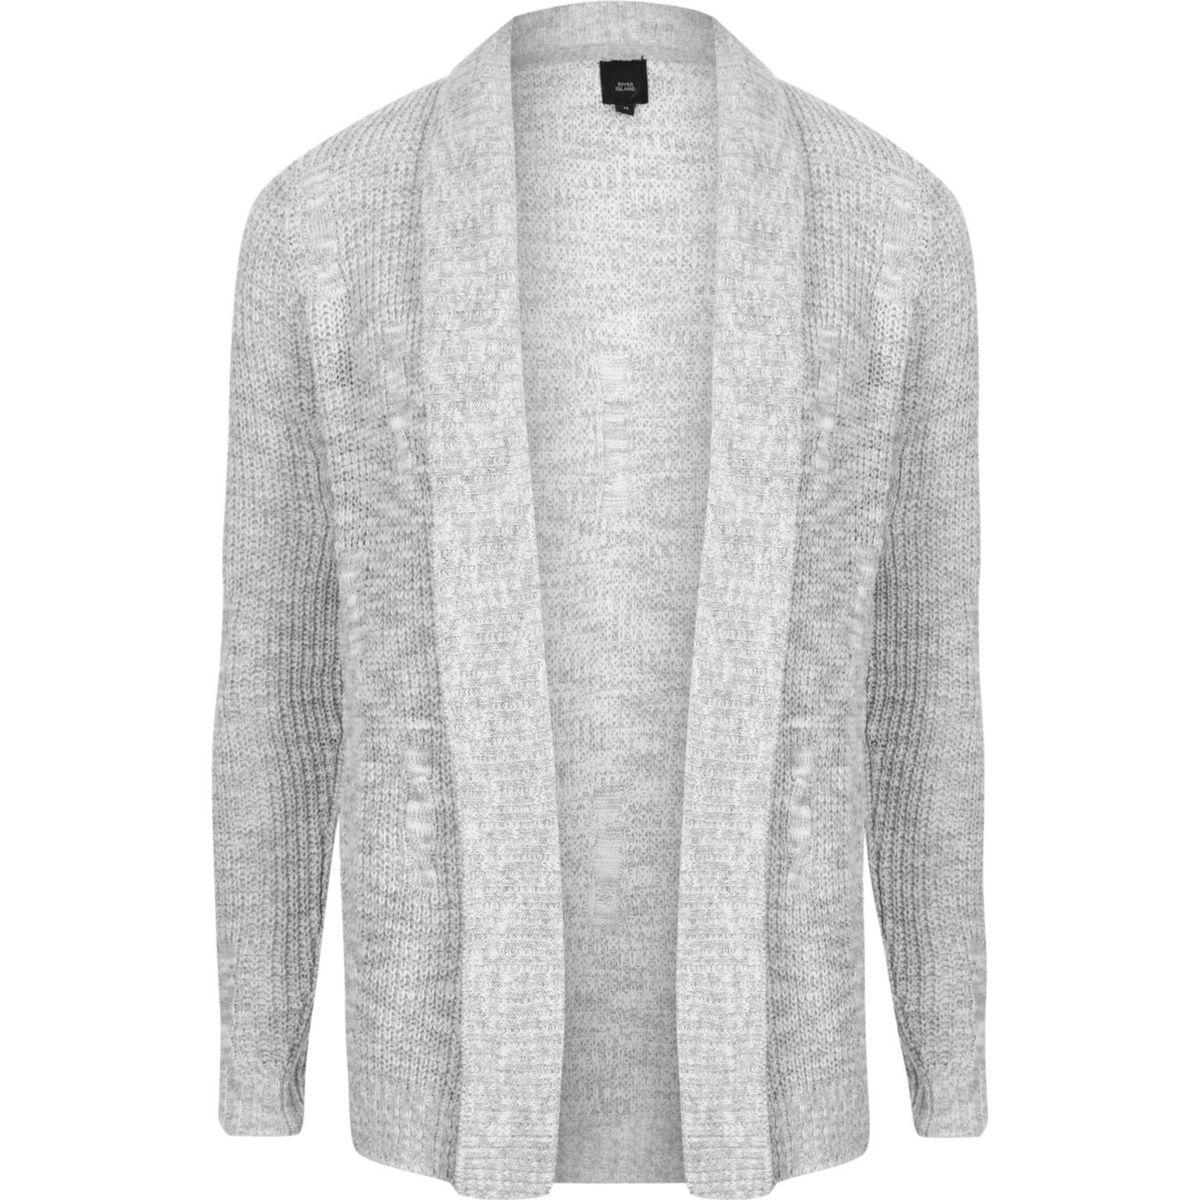 Grey rib cable knit slim fit cardigan